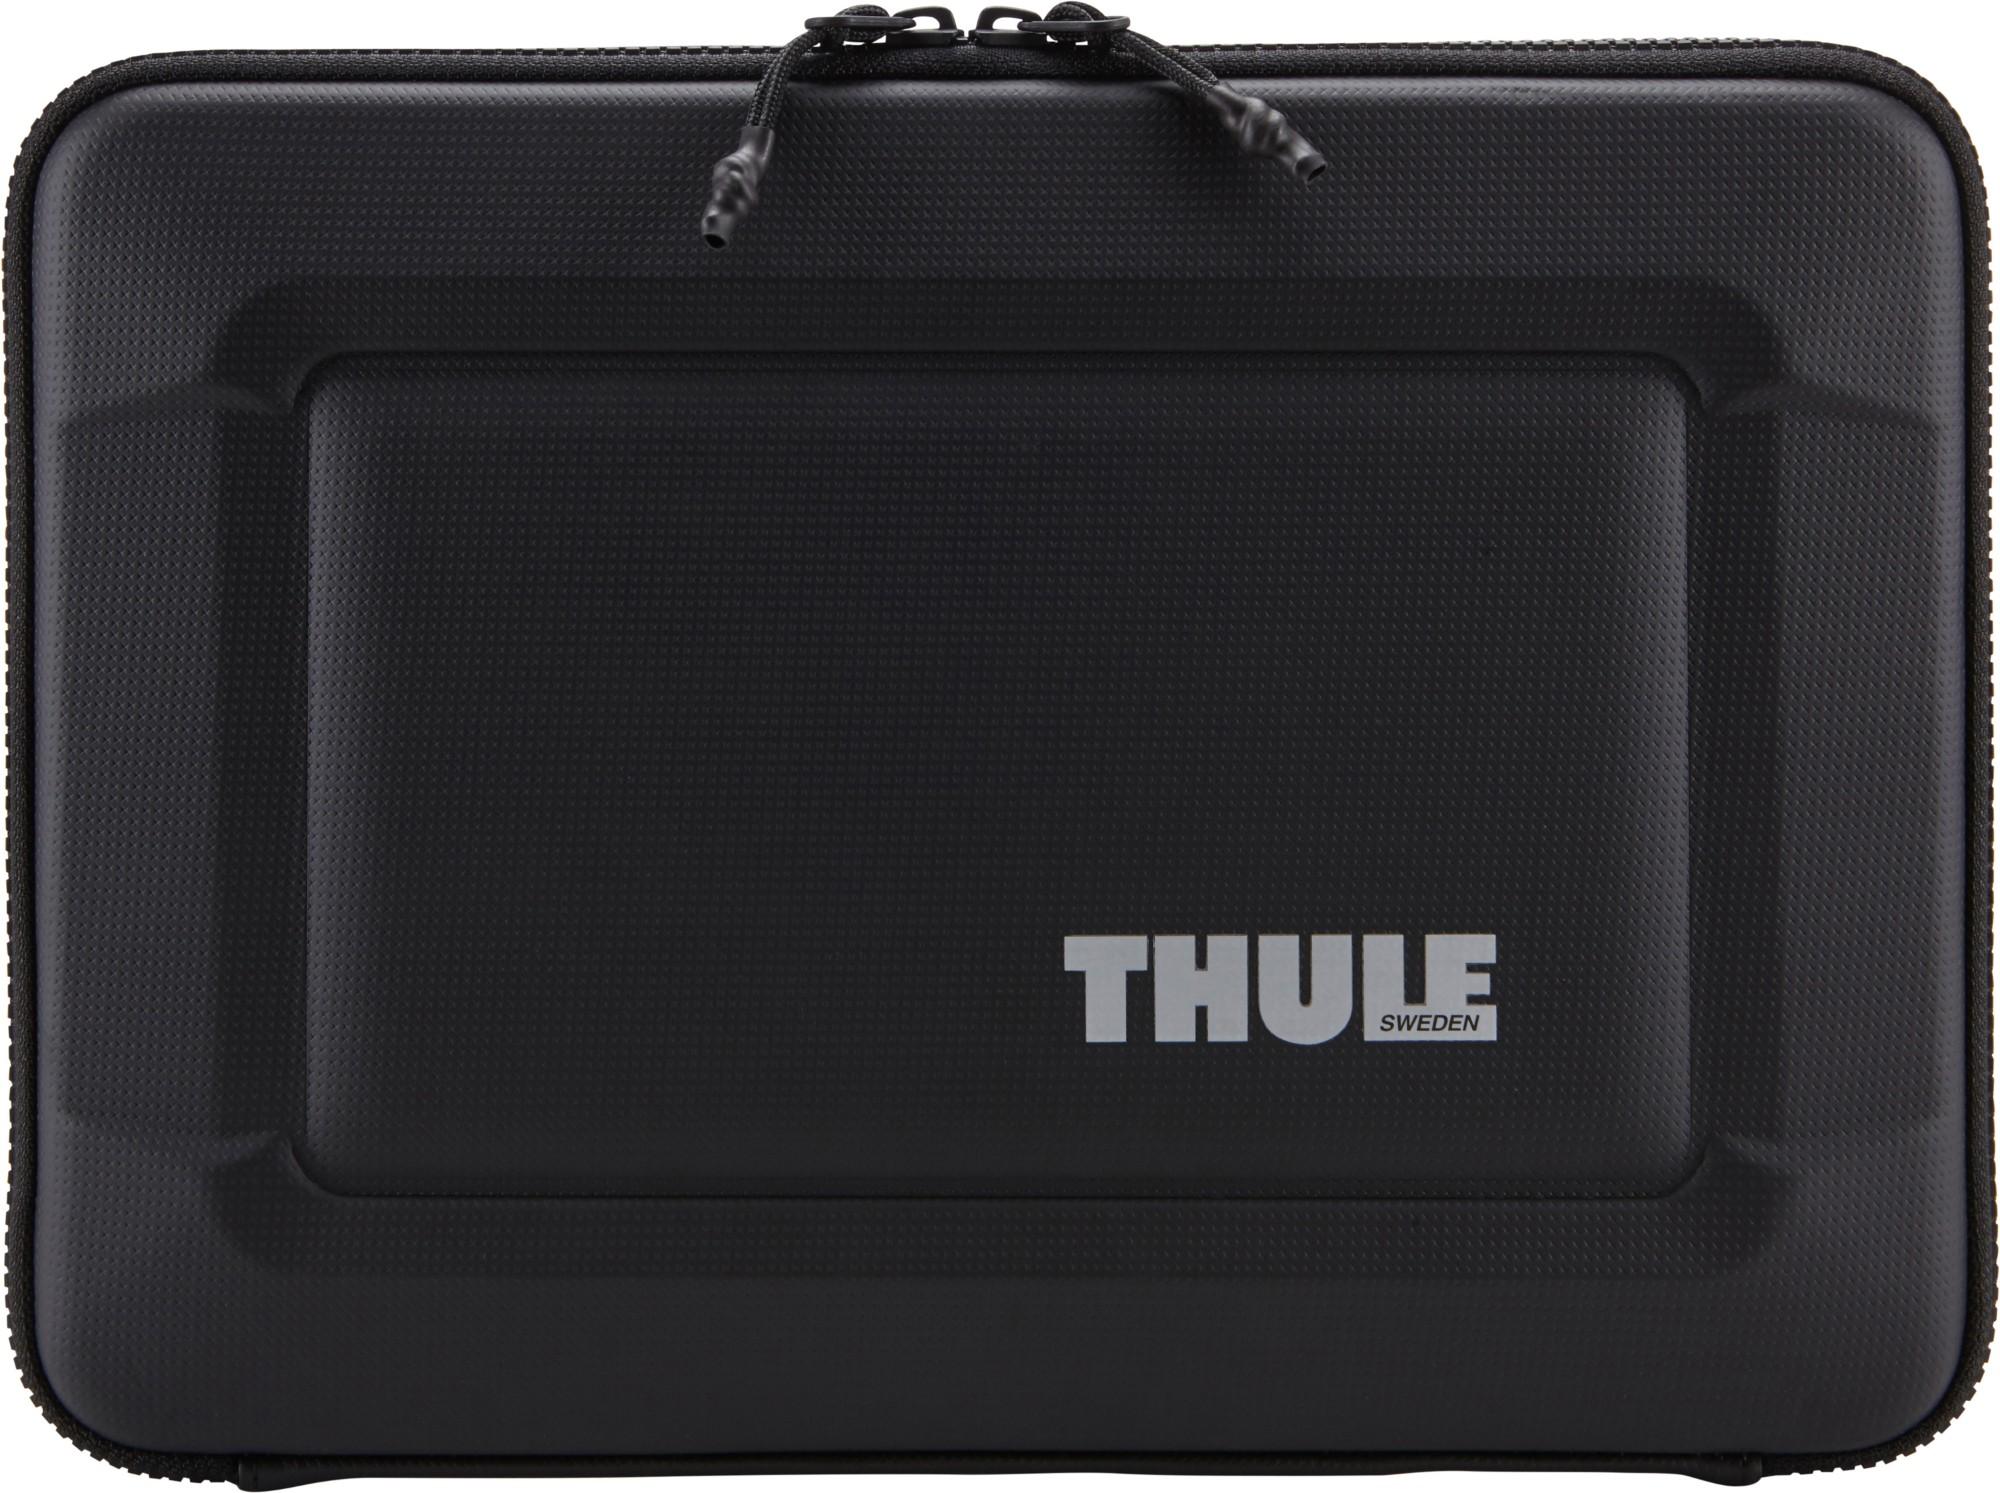 "Thule Gauntlet 3.0 notebook case 33 cm (13"") Sleeve case Black"